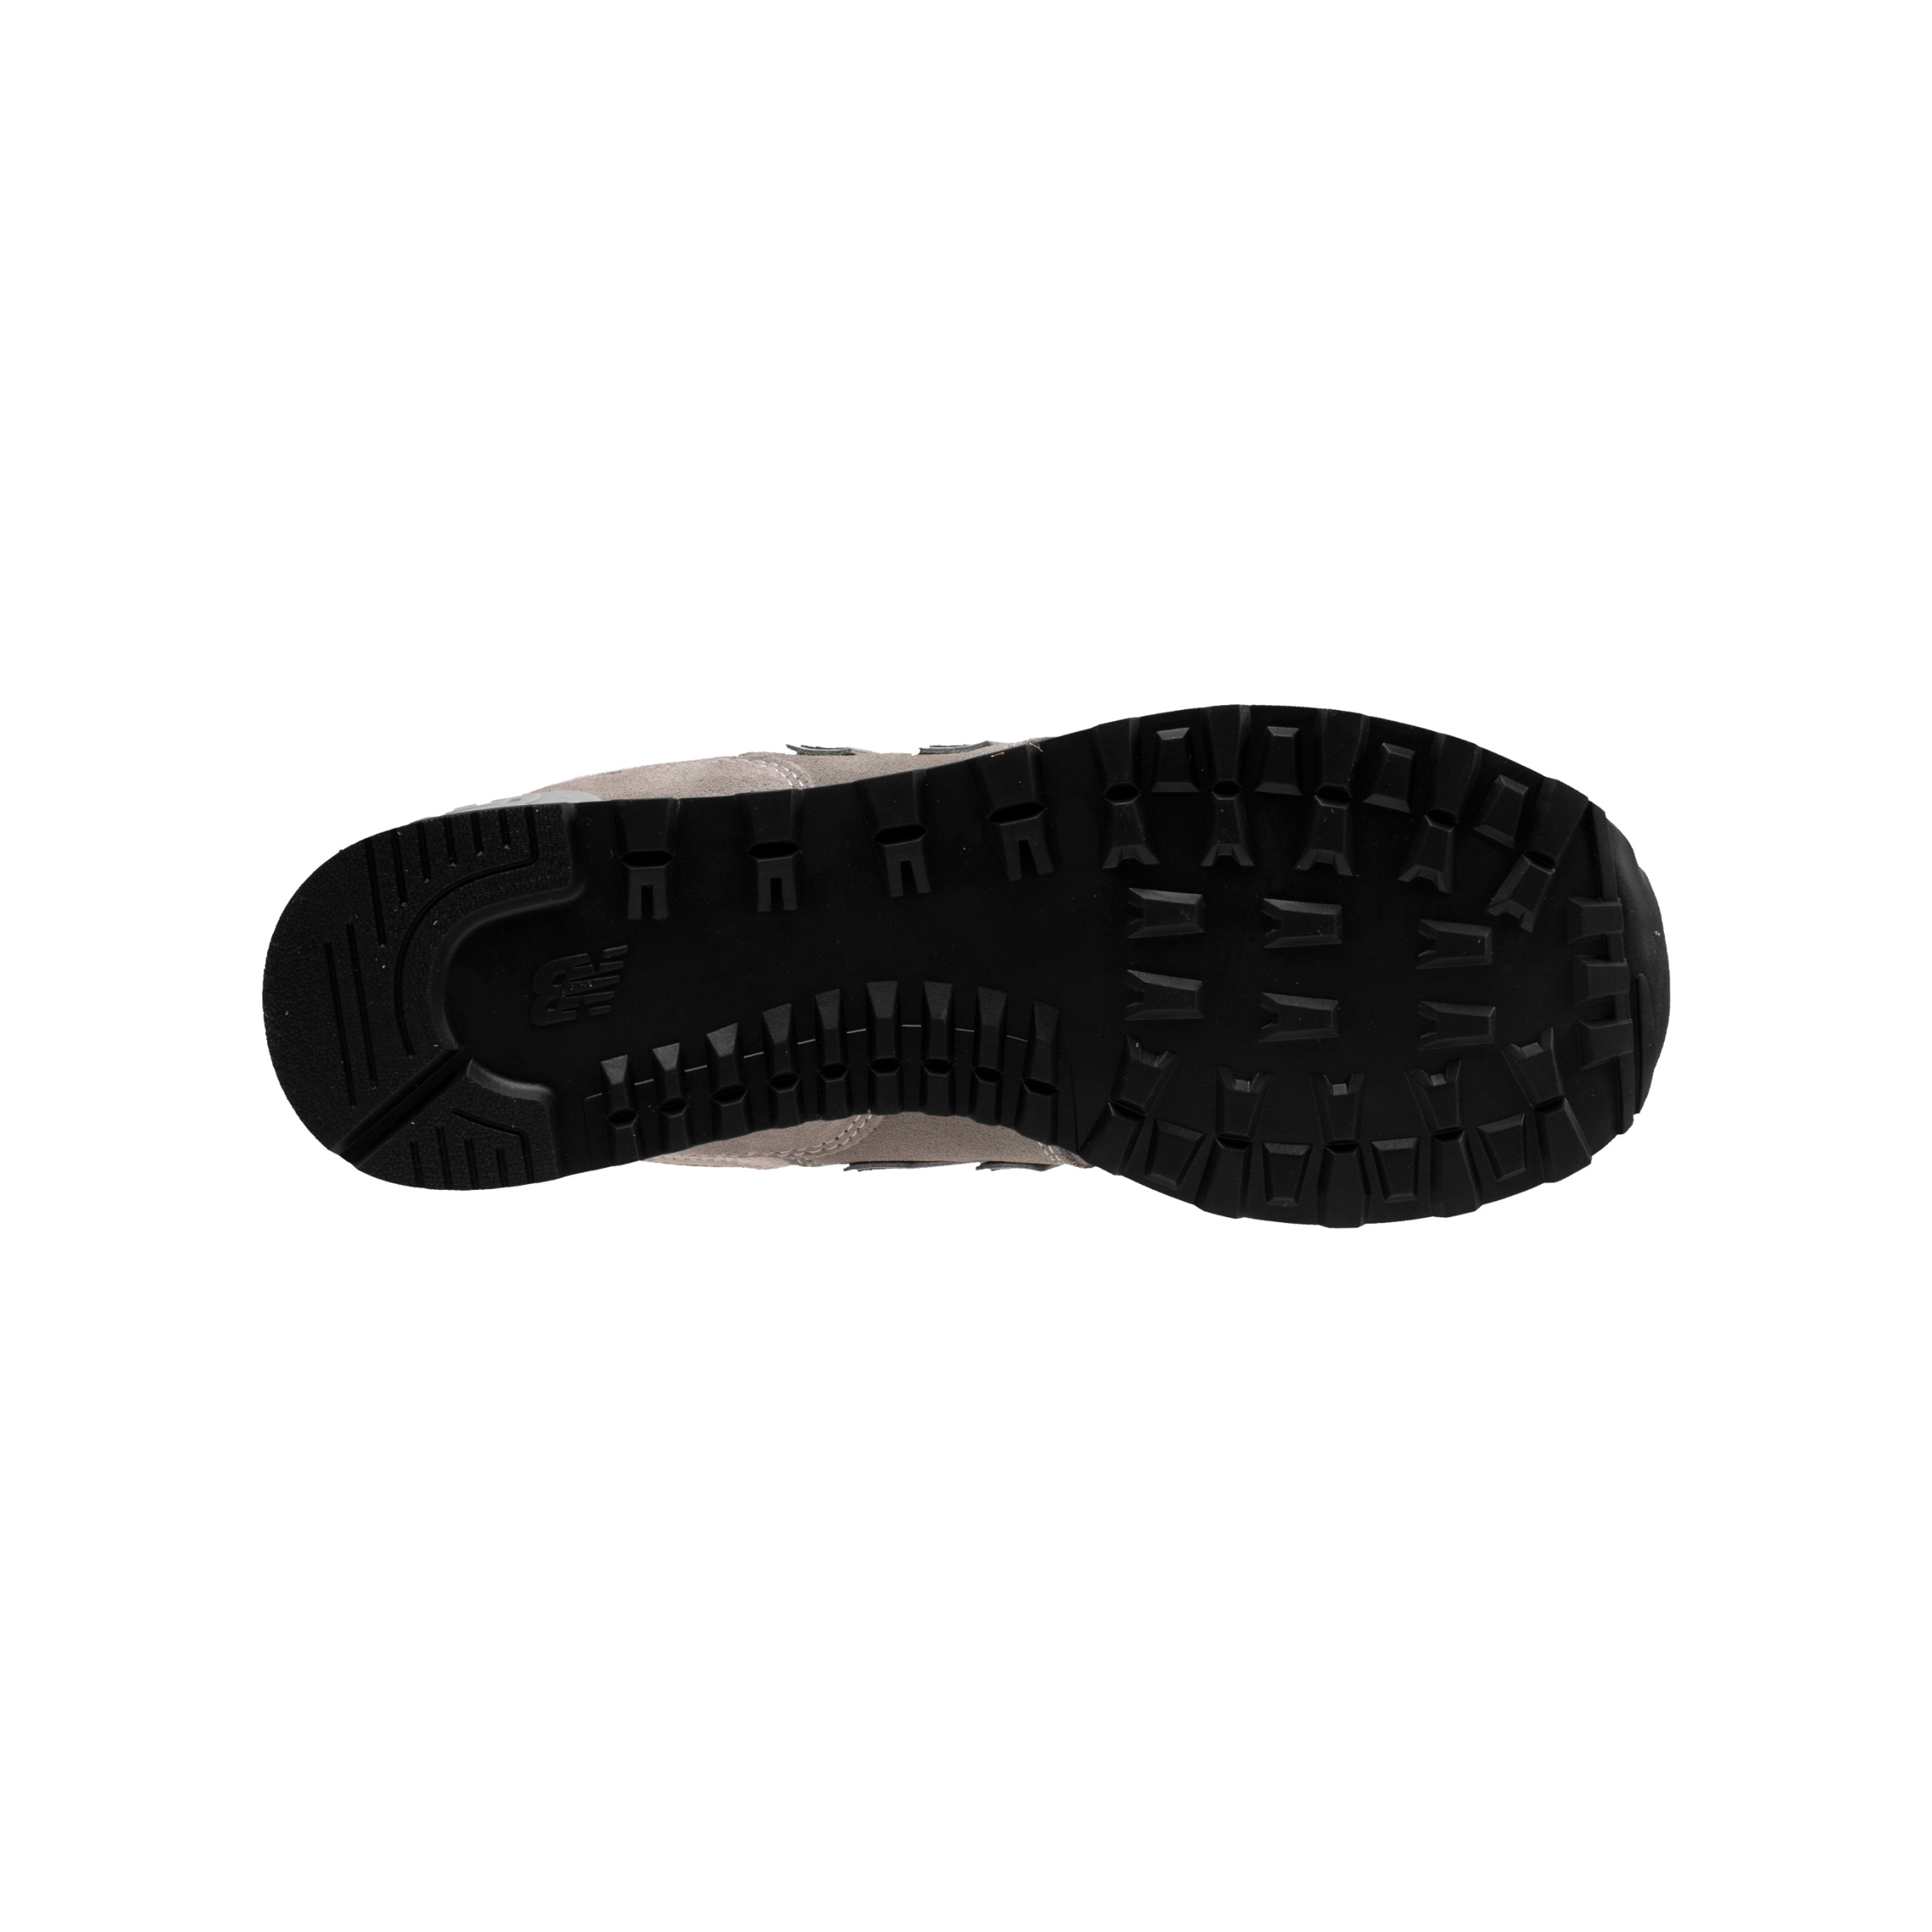 New Balance ML574 Sneaker Grau F121